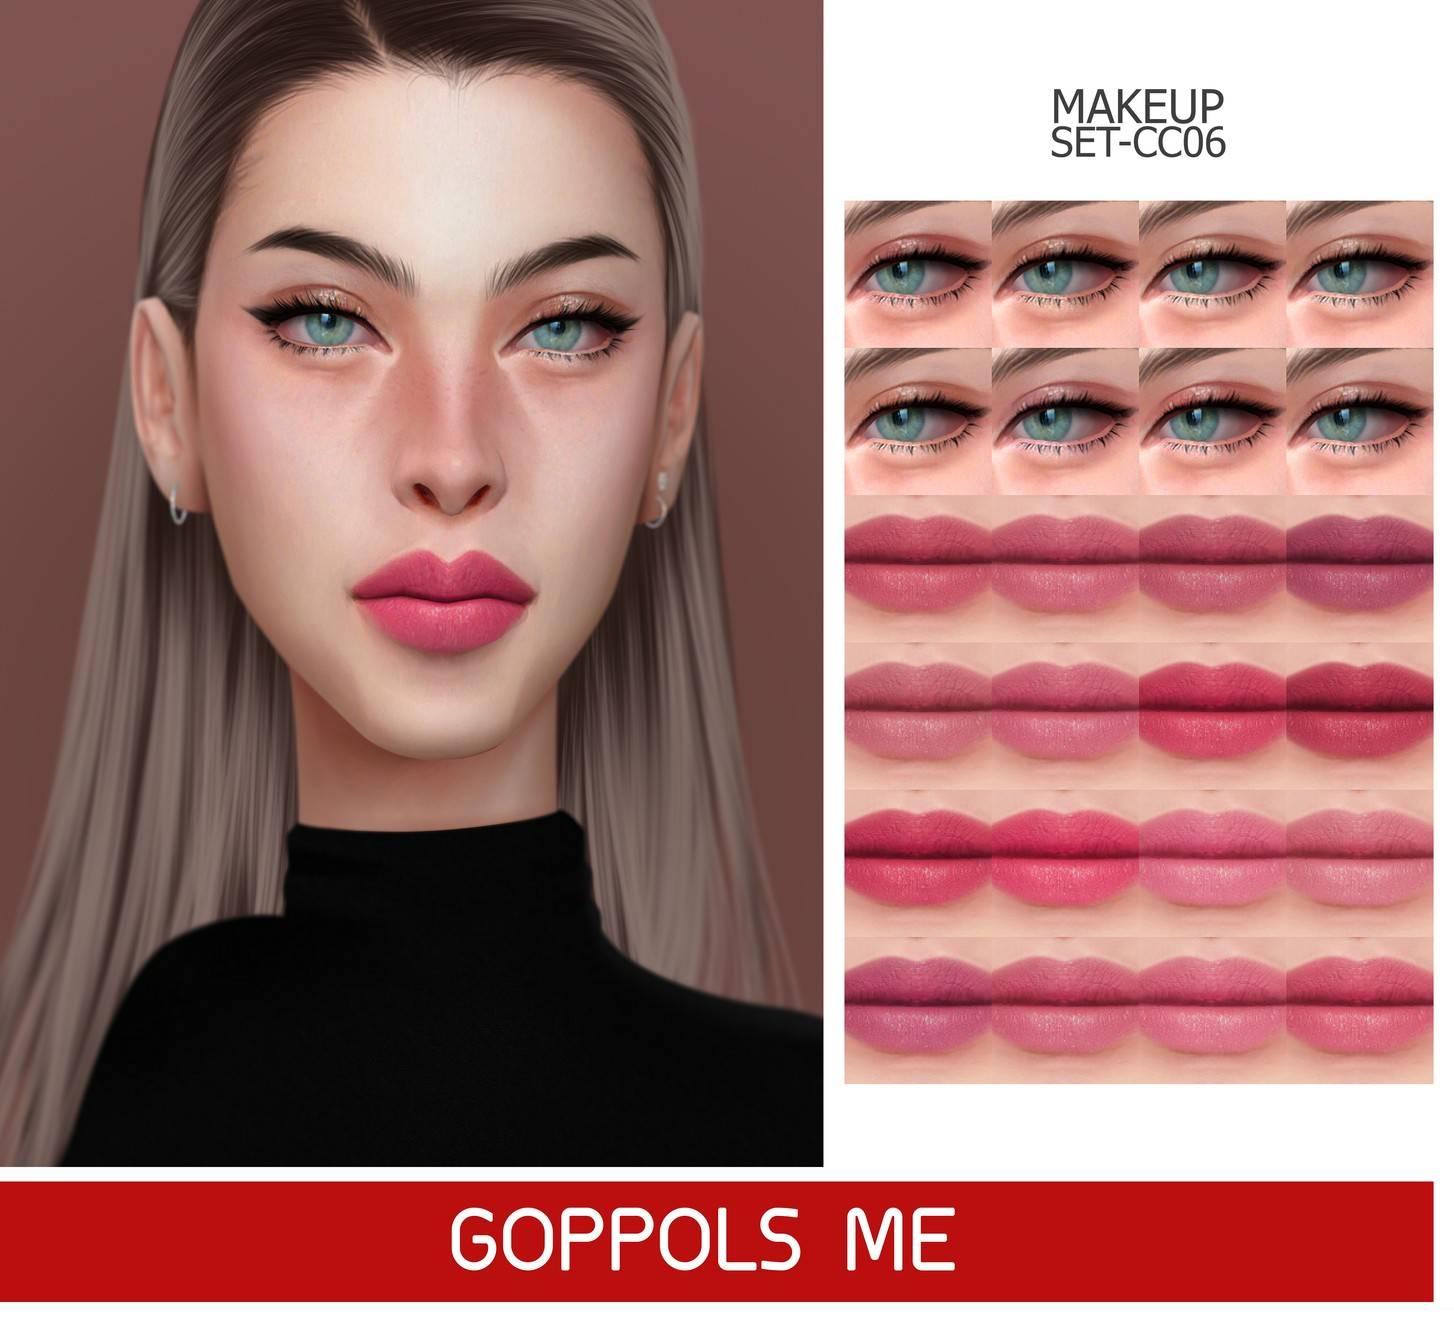 Набор косметики - MAKEUP SET CC06